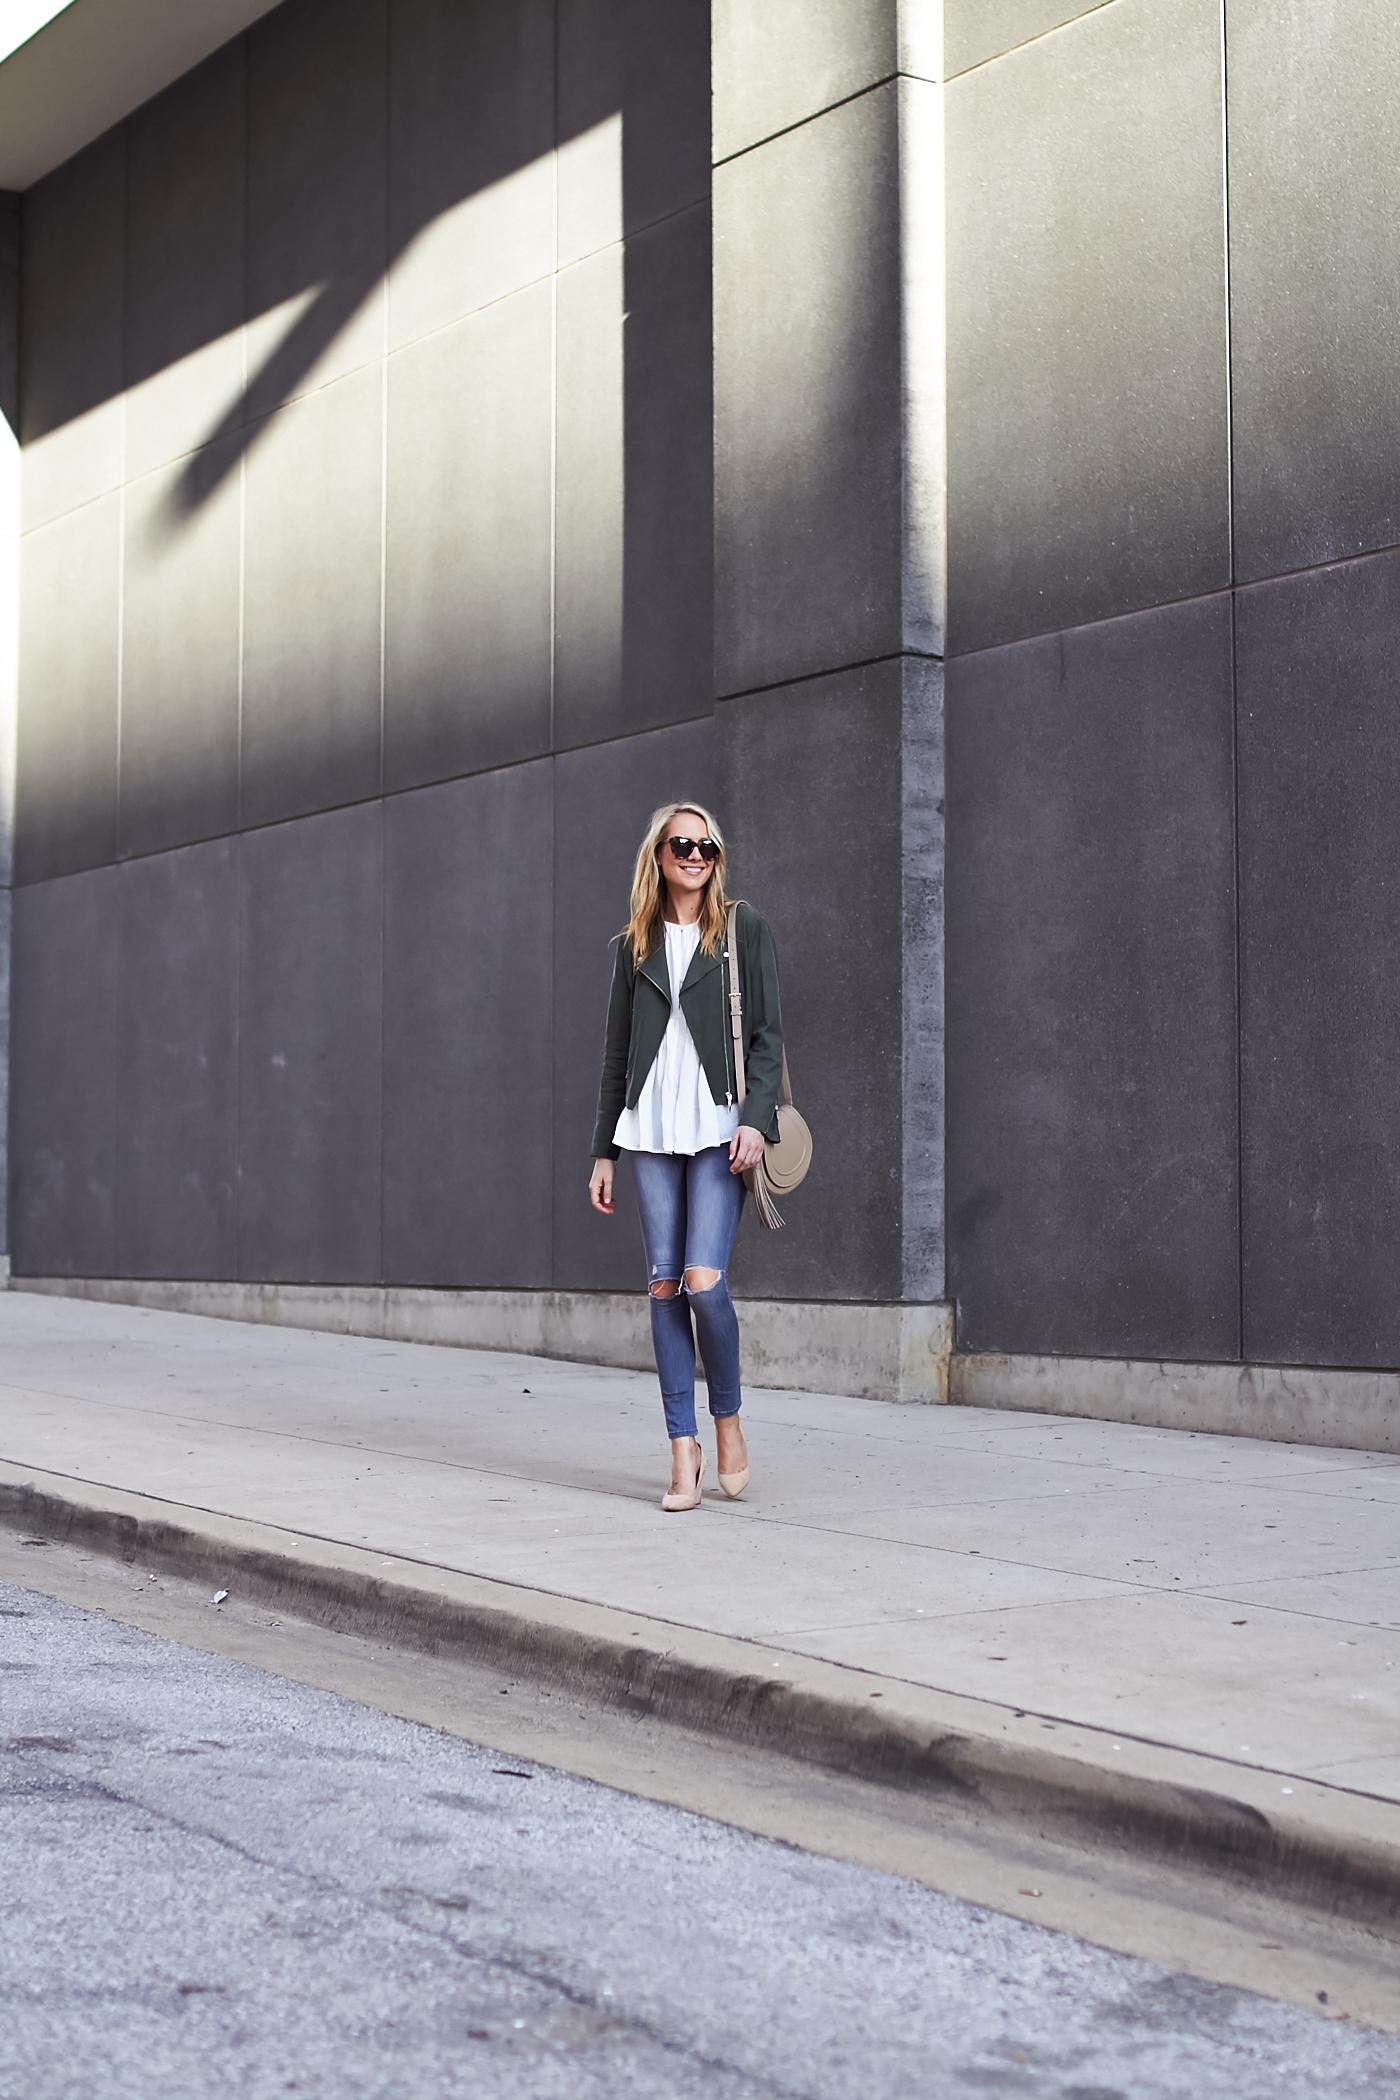 fashion-jackson-ripped-skinny-jeans-club-monaco-olive-green-moto-jacket